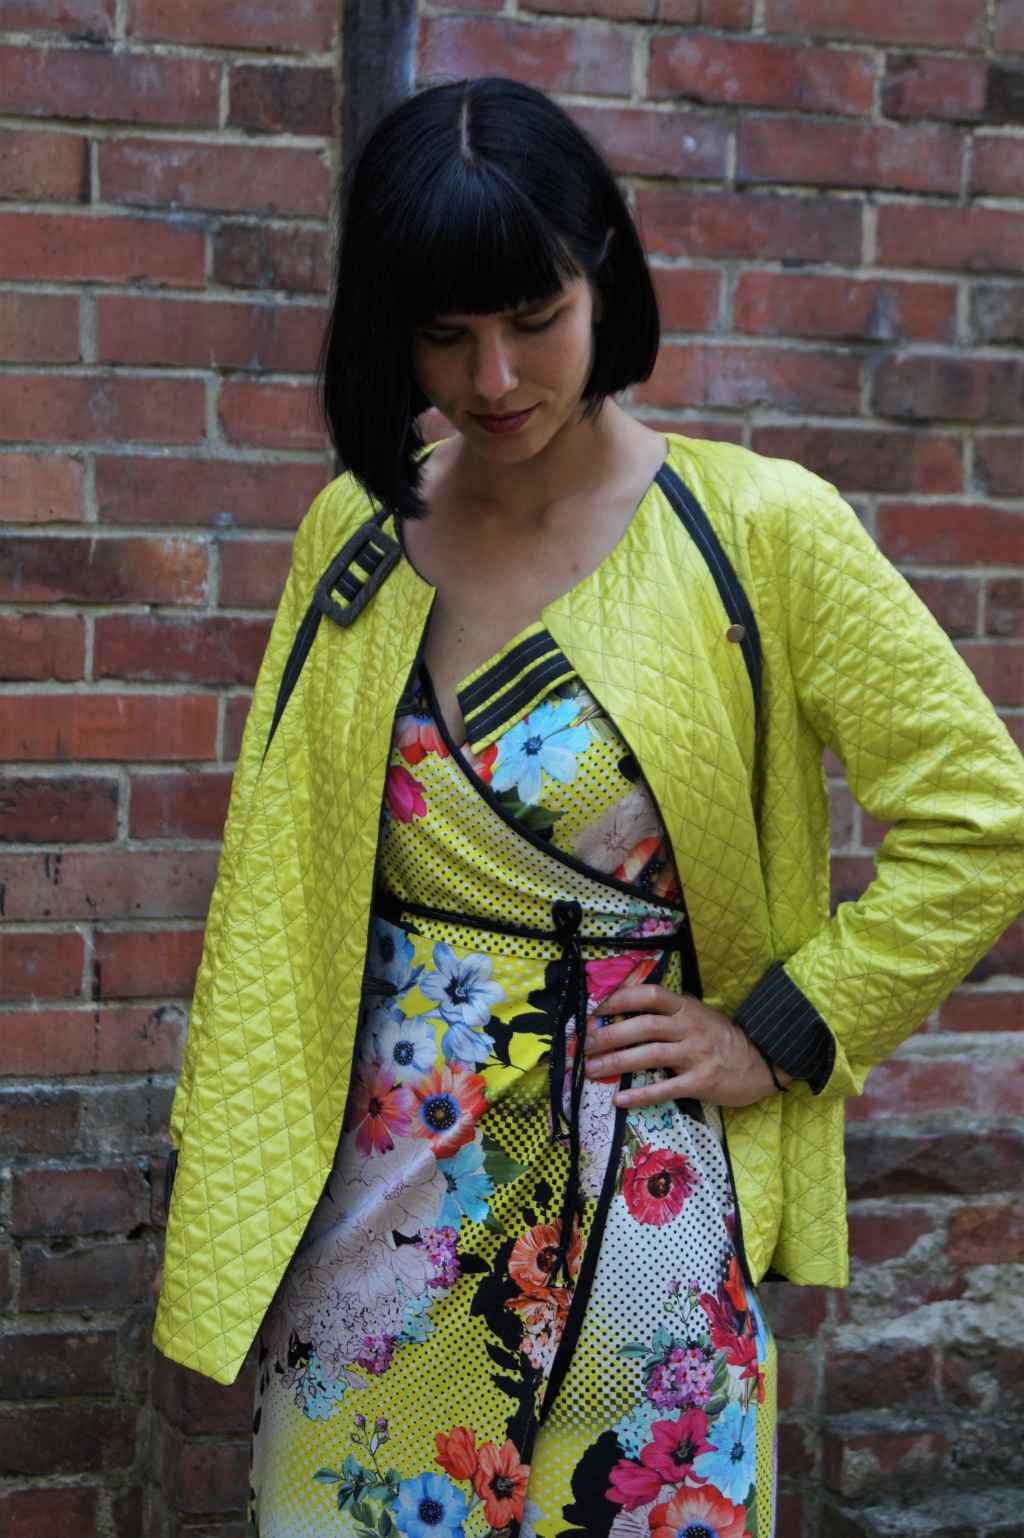 Mode von Gisela Berg